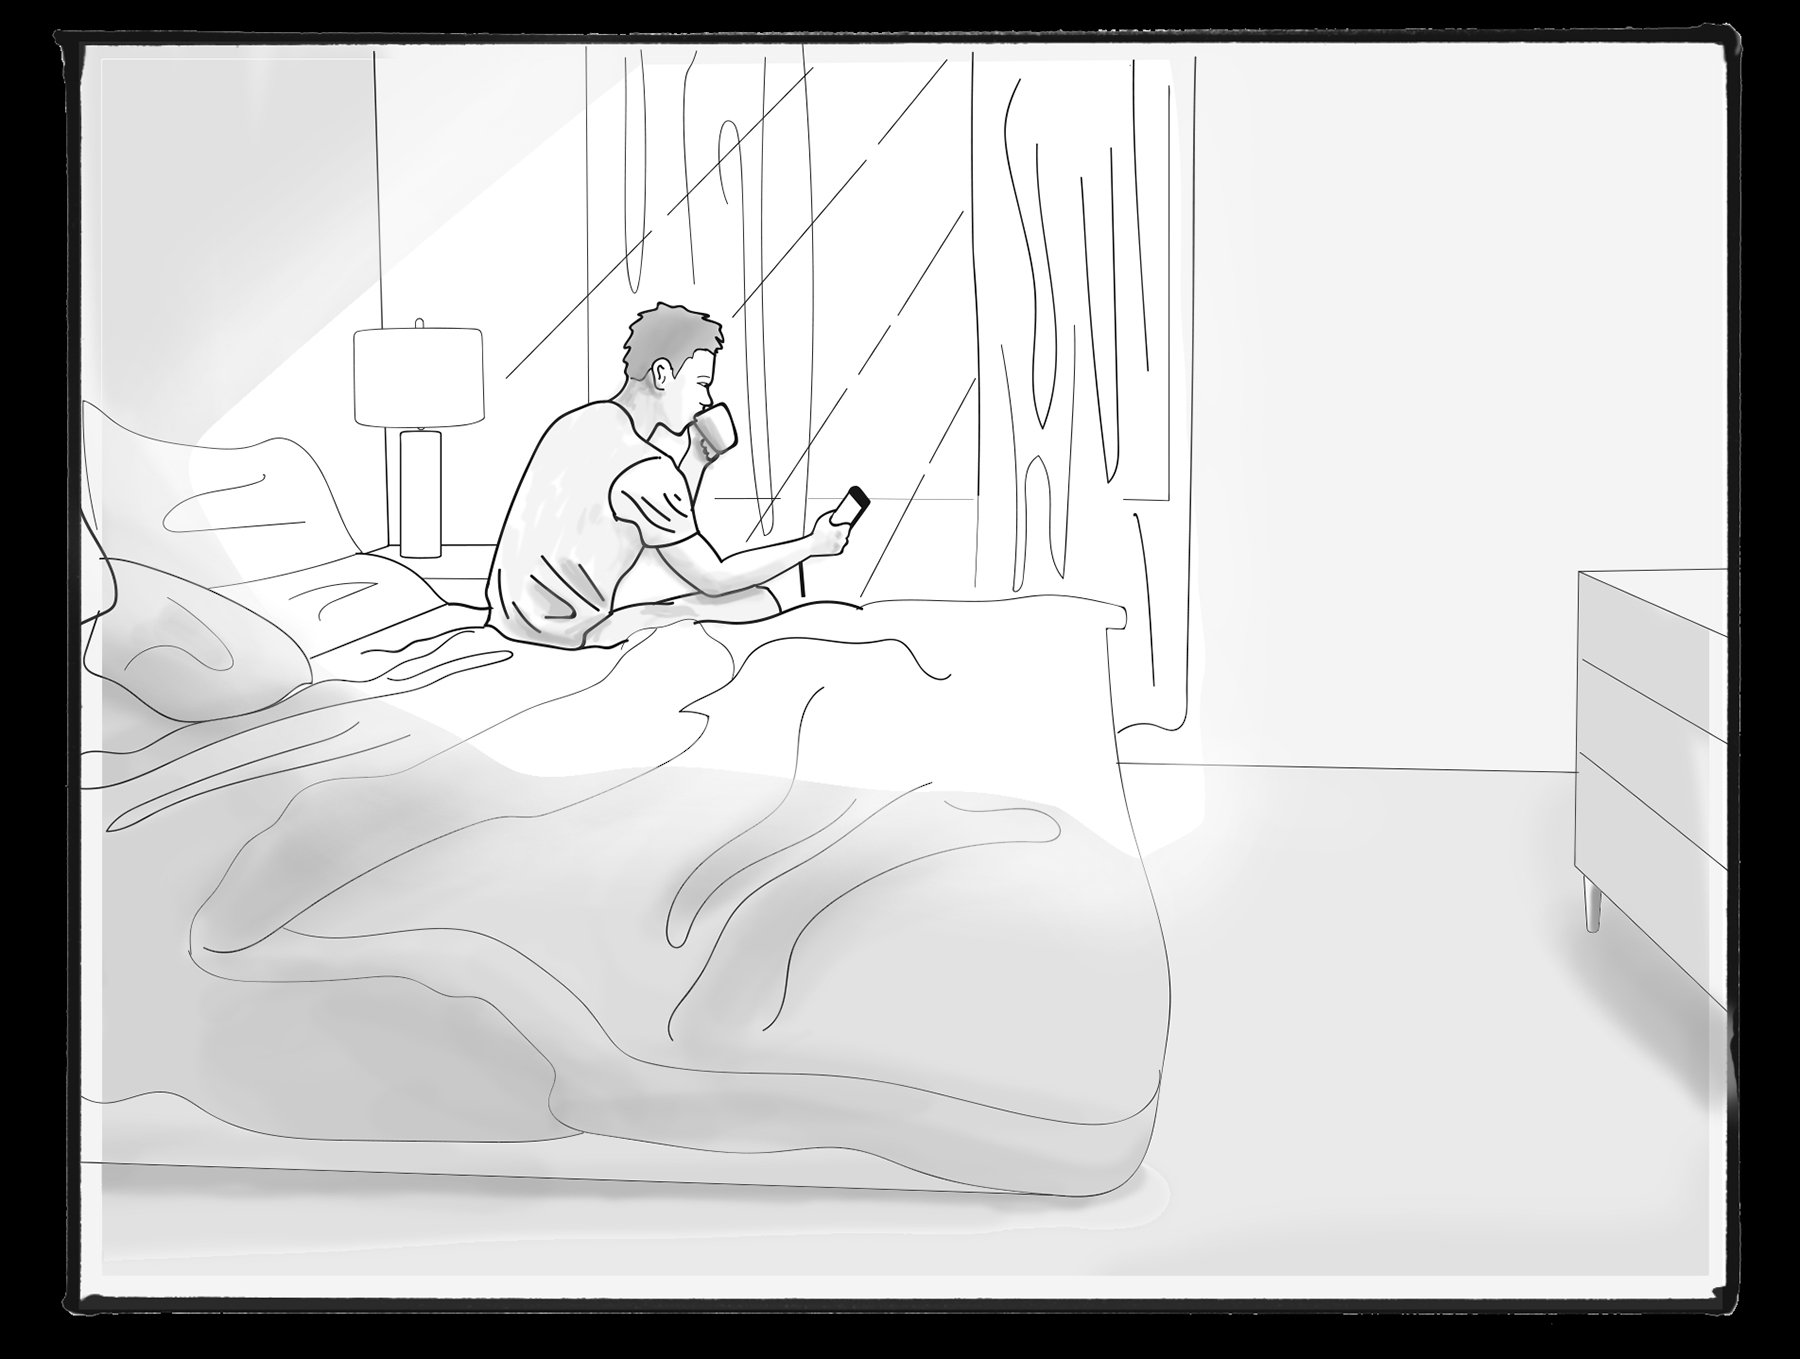 Storyboard_Sketch_1b.jpg